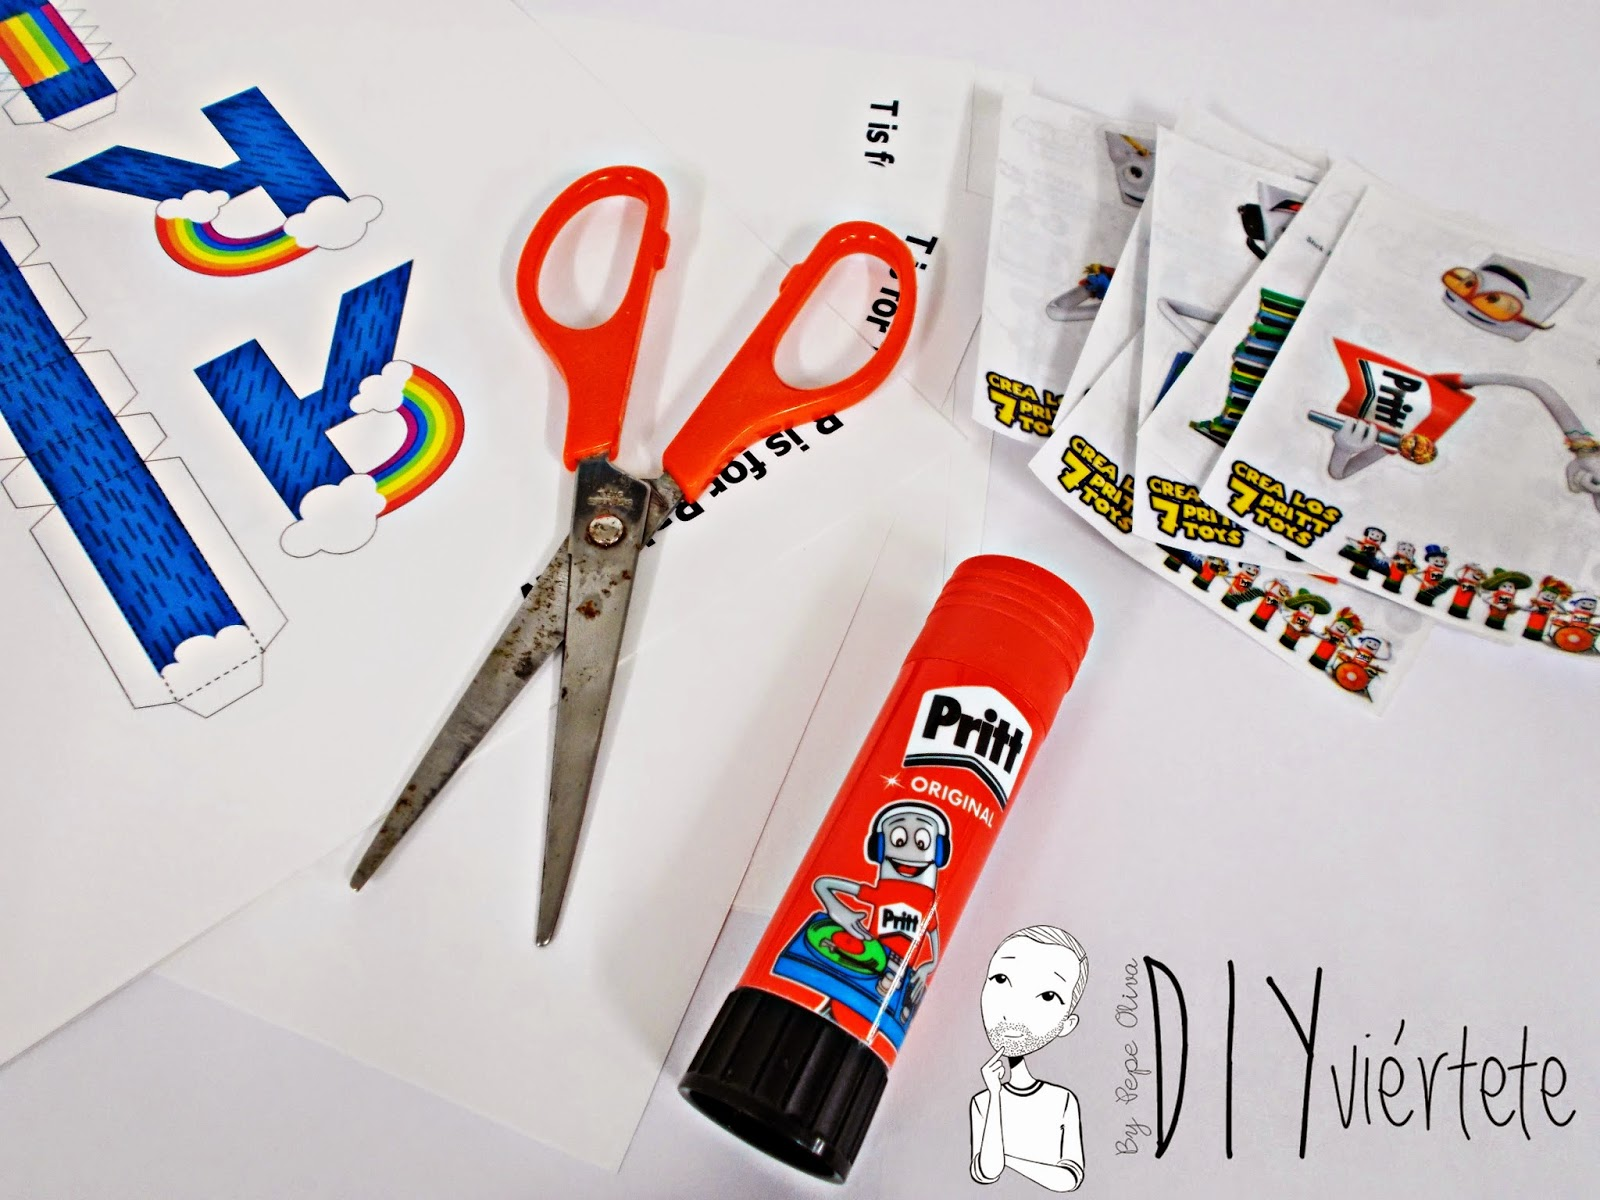 DIY-manualidades-pegamento-adhesivo-barra-Pritt-papertoy-recortables-2